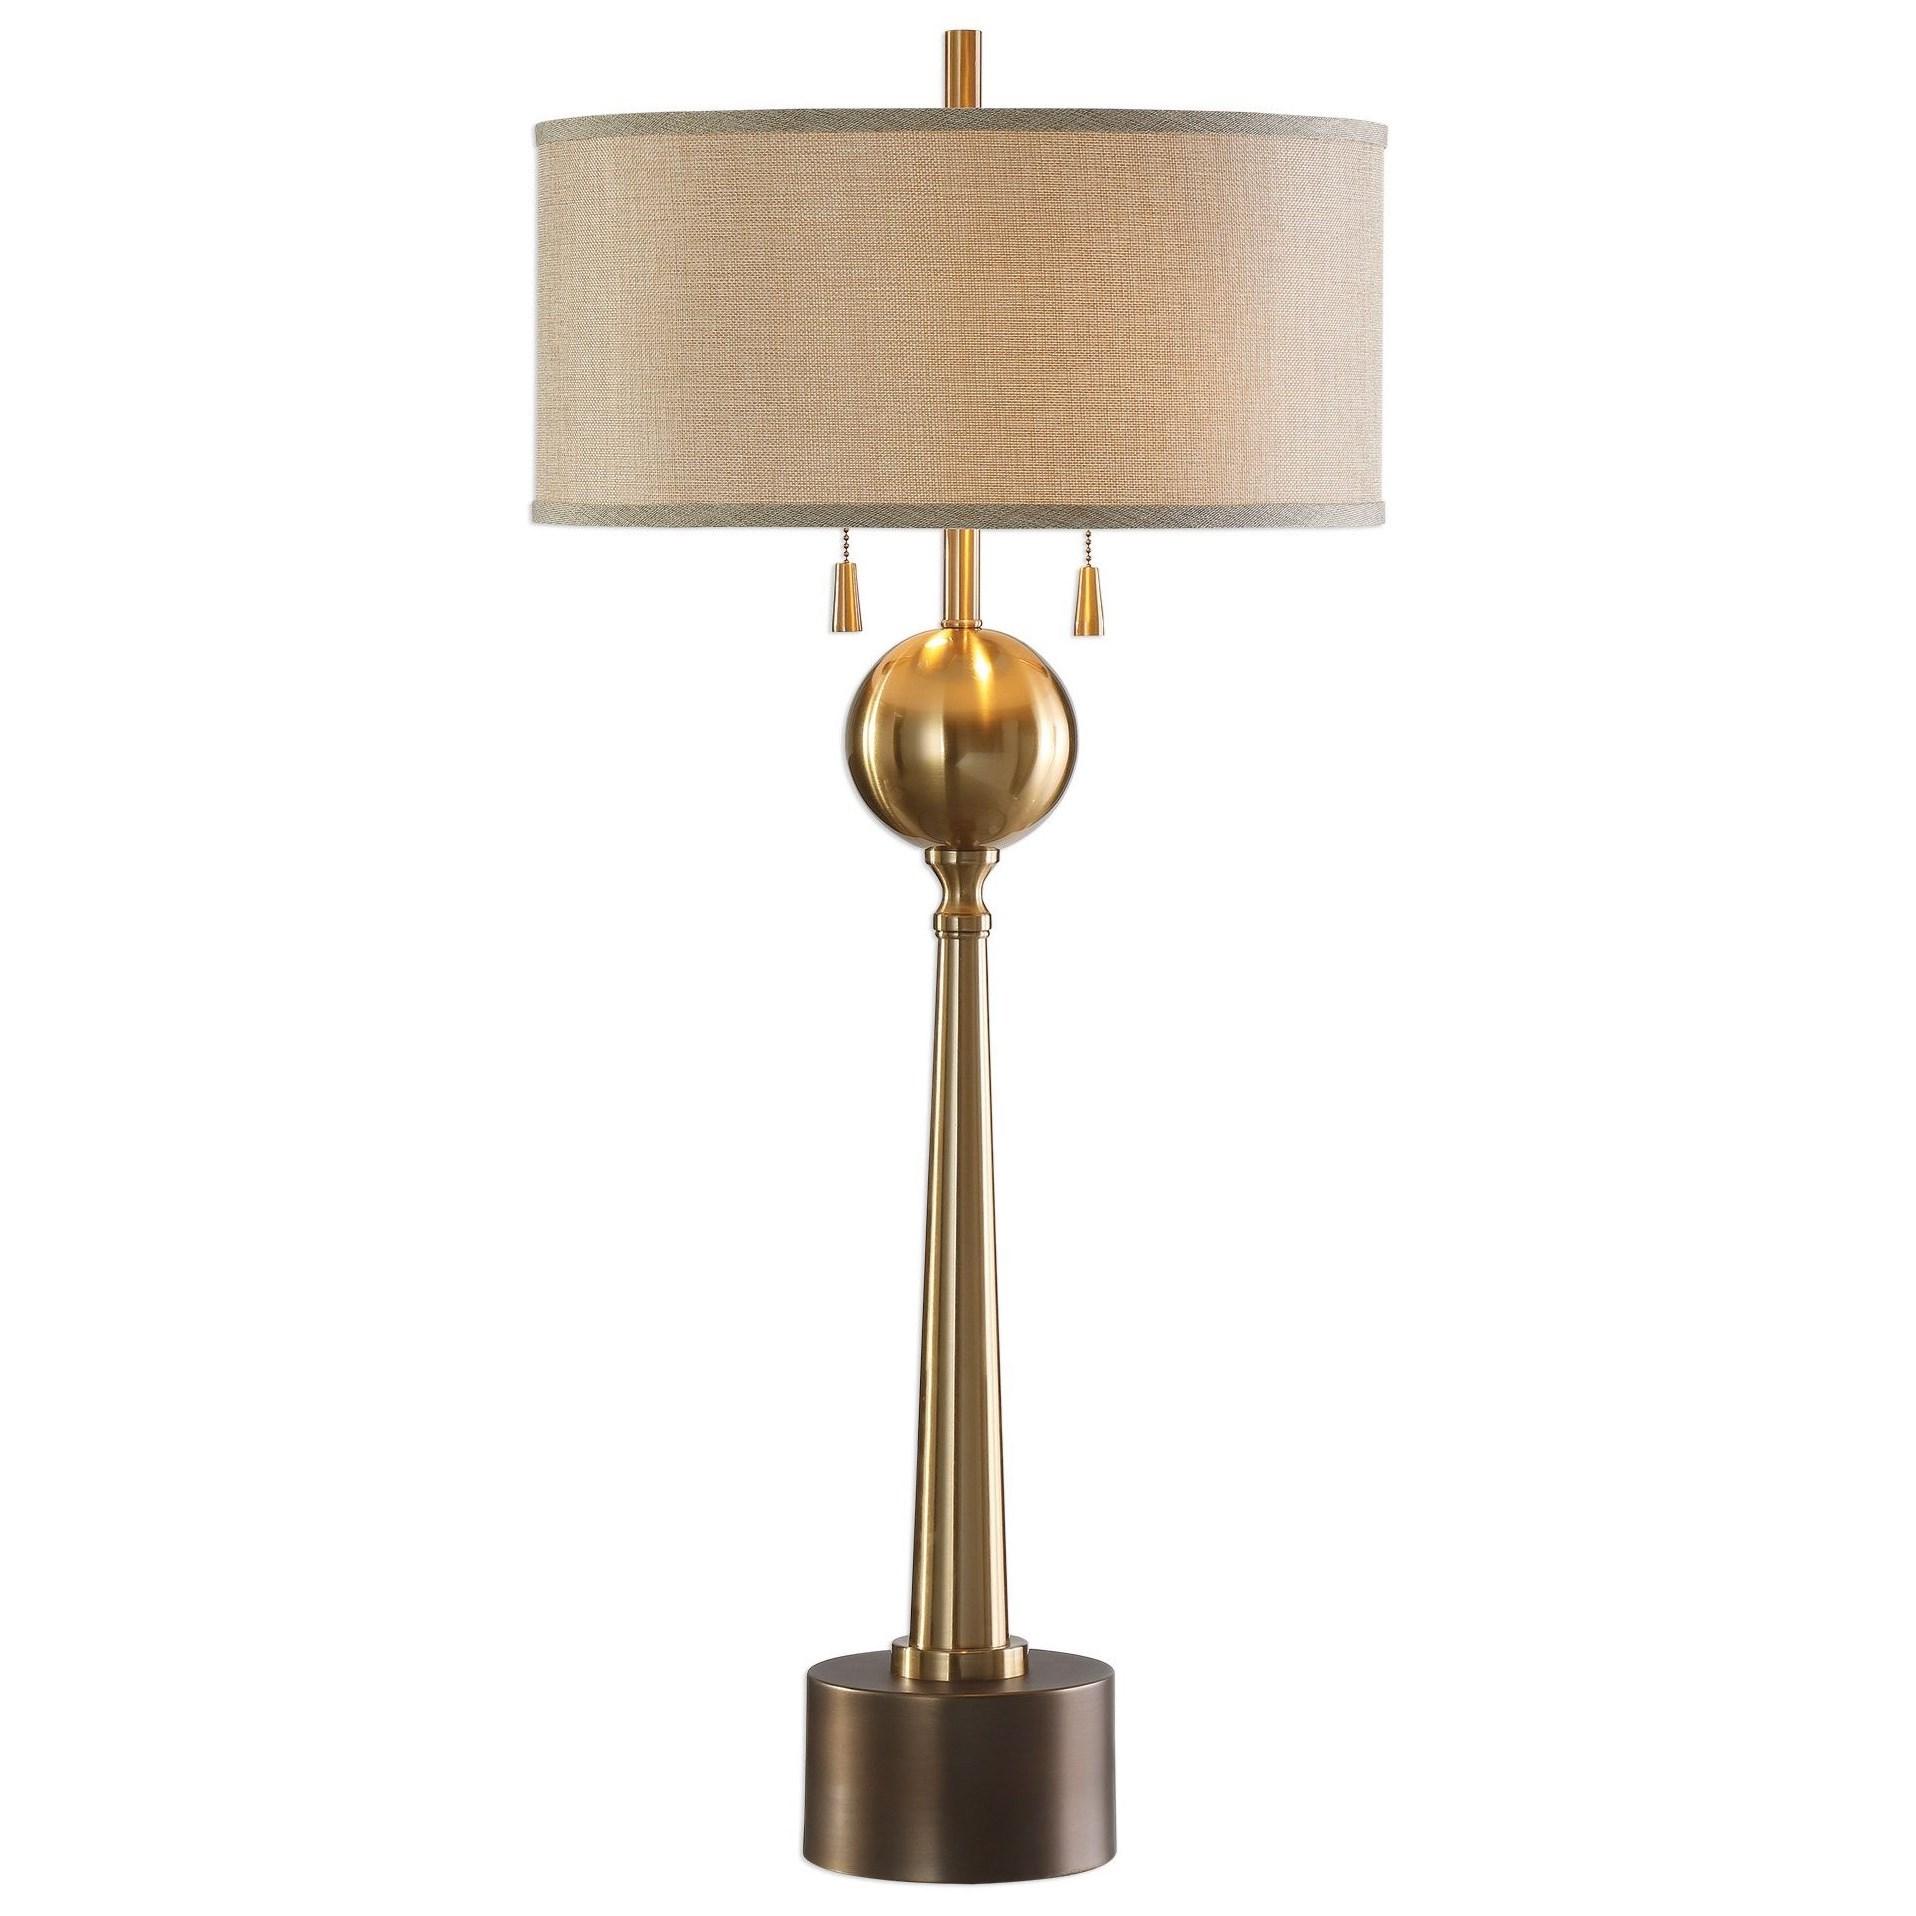 Kensett Antique Bronze Lamp